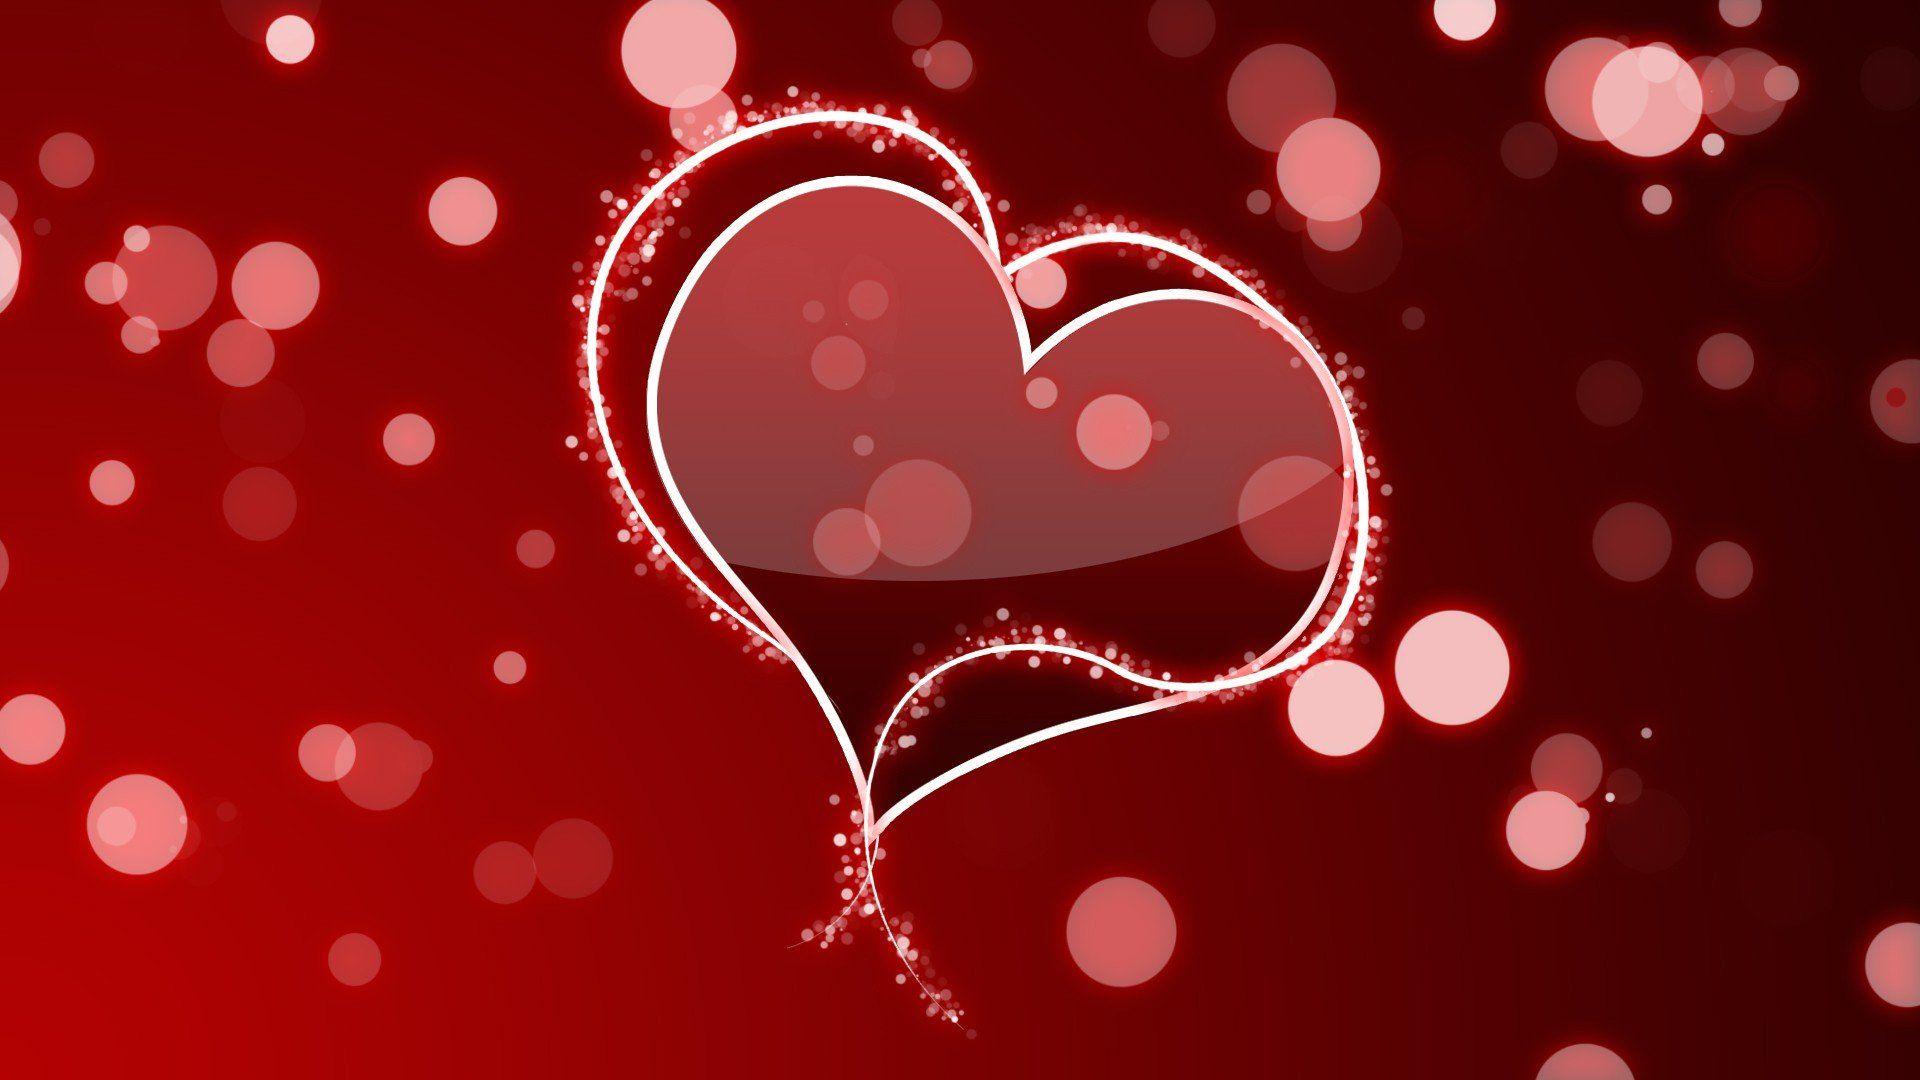 Image Of Love hd image